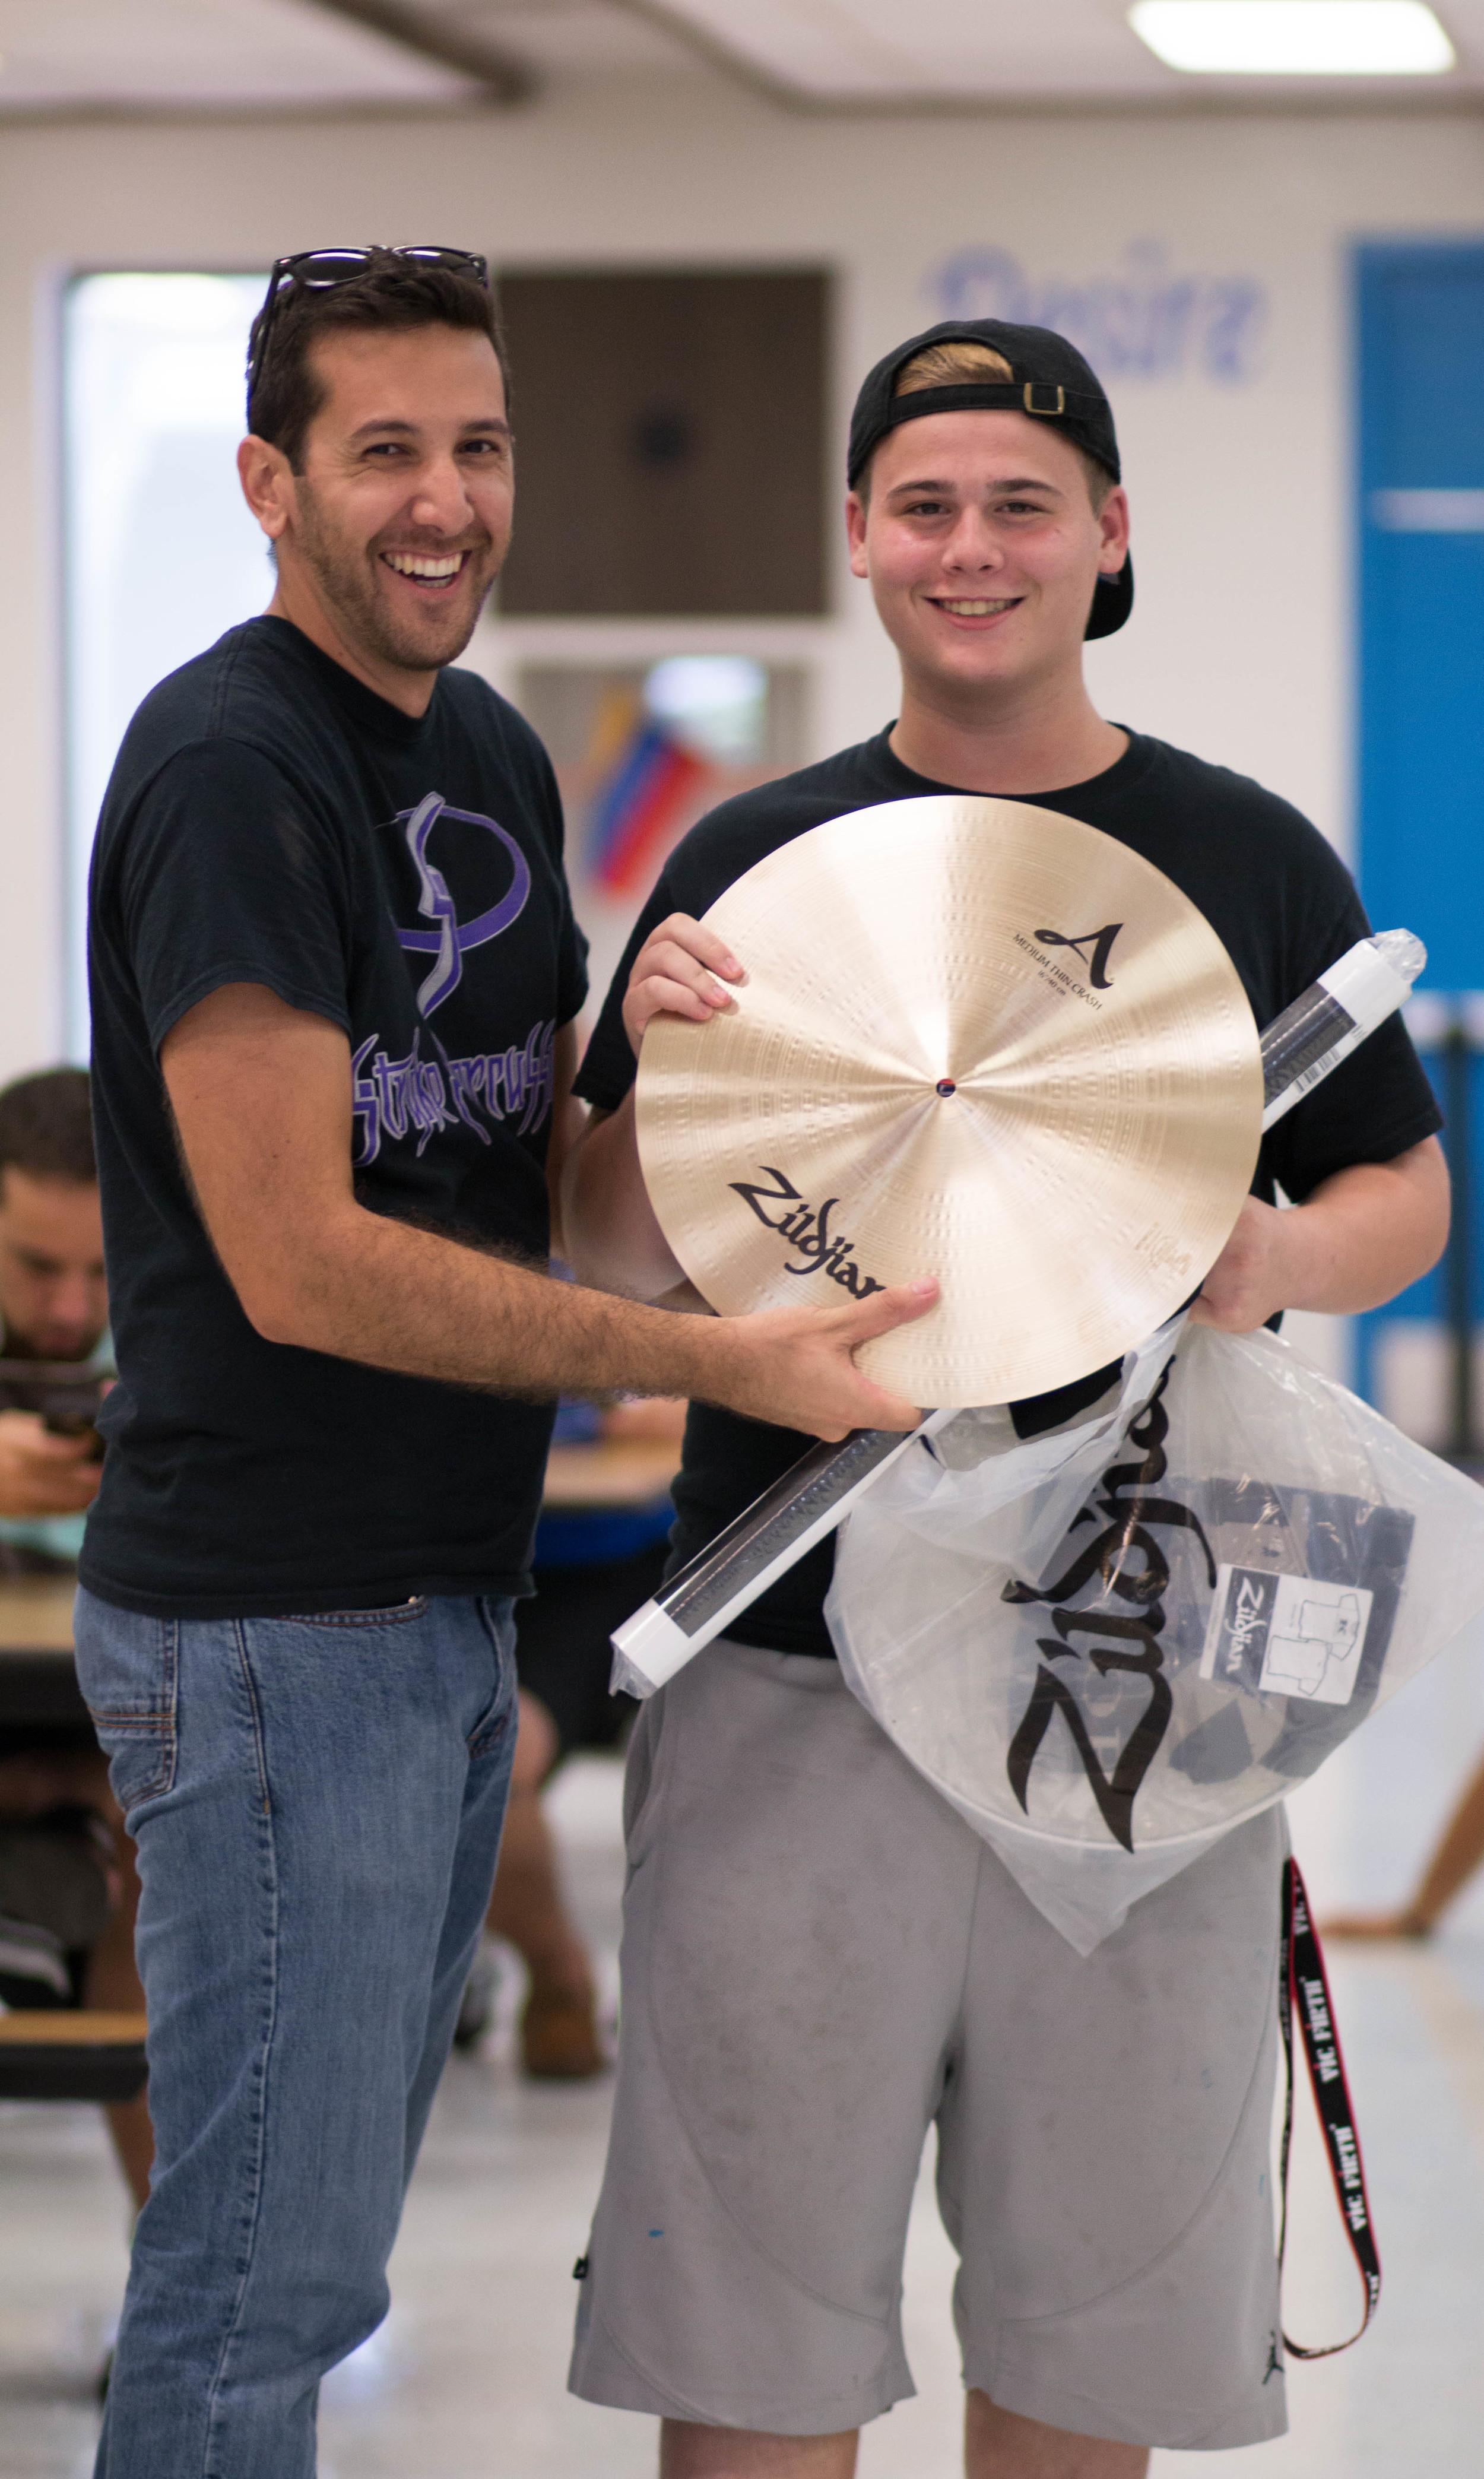 "Grand prize winner took home a 16"" Zildjian Cymbal!"